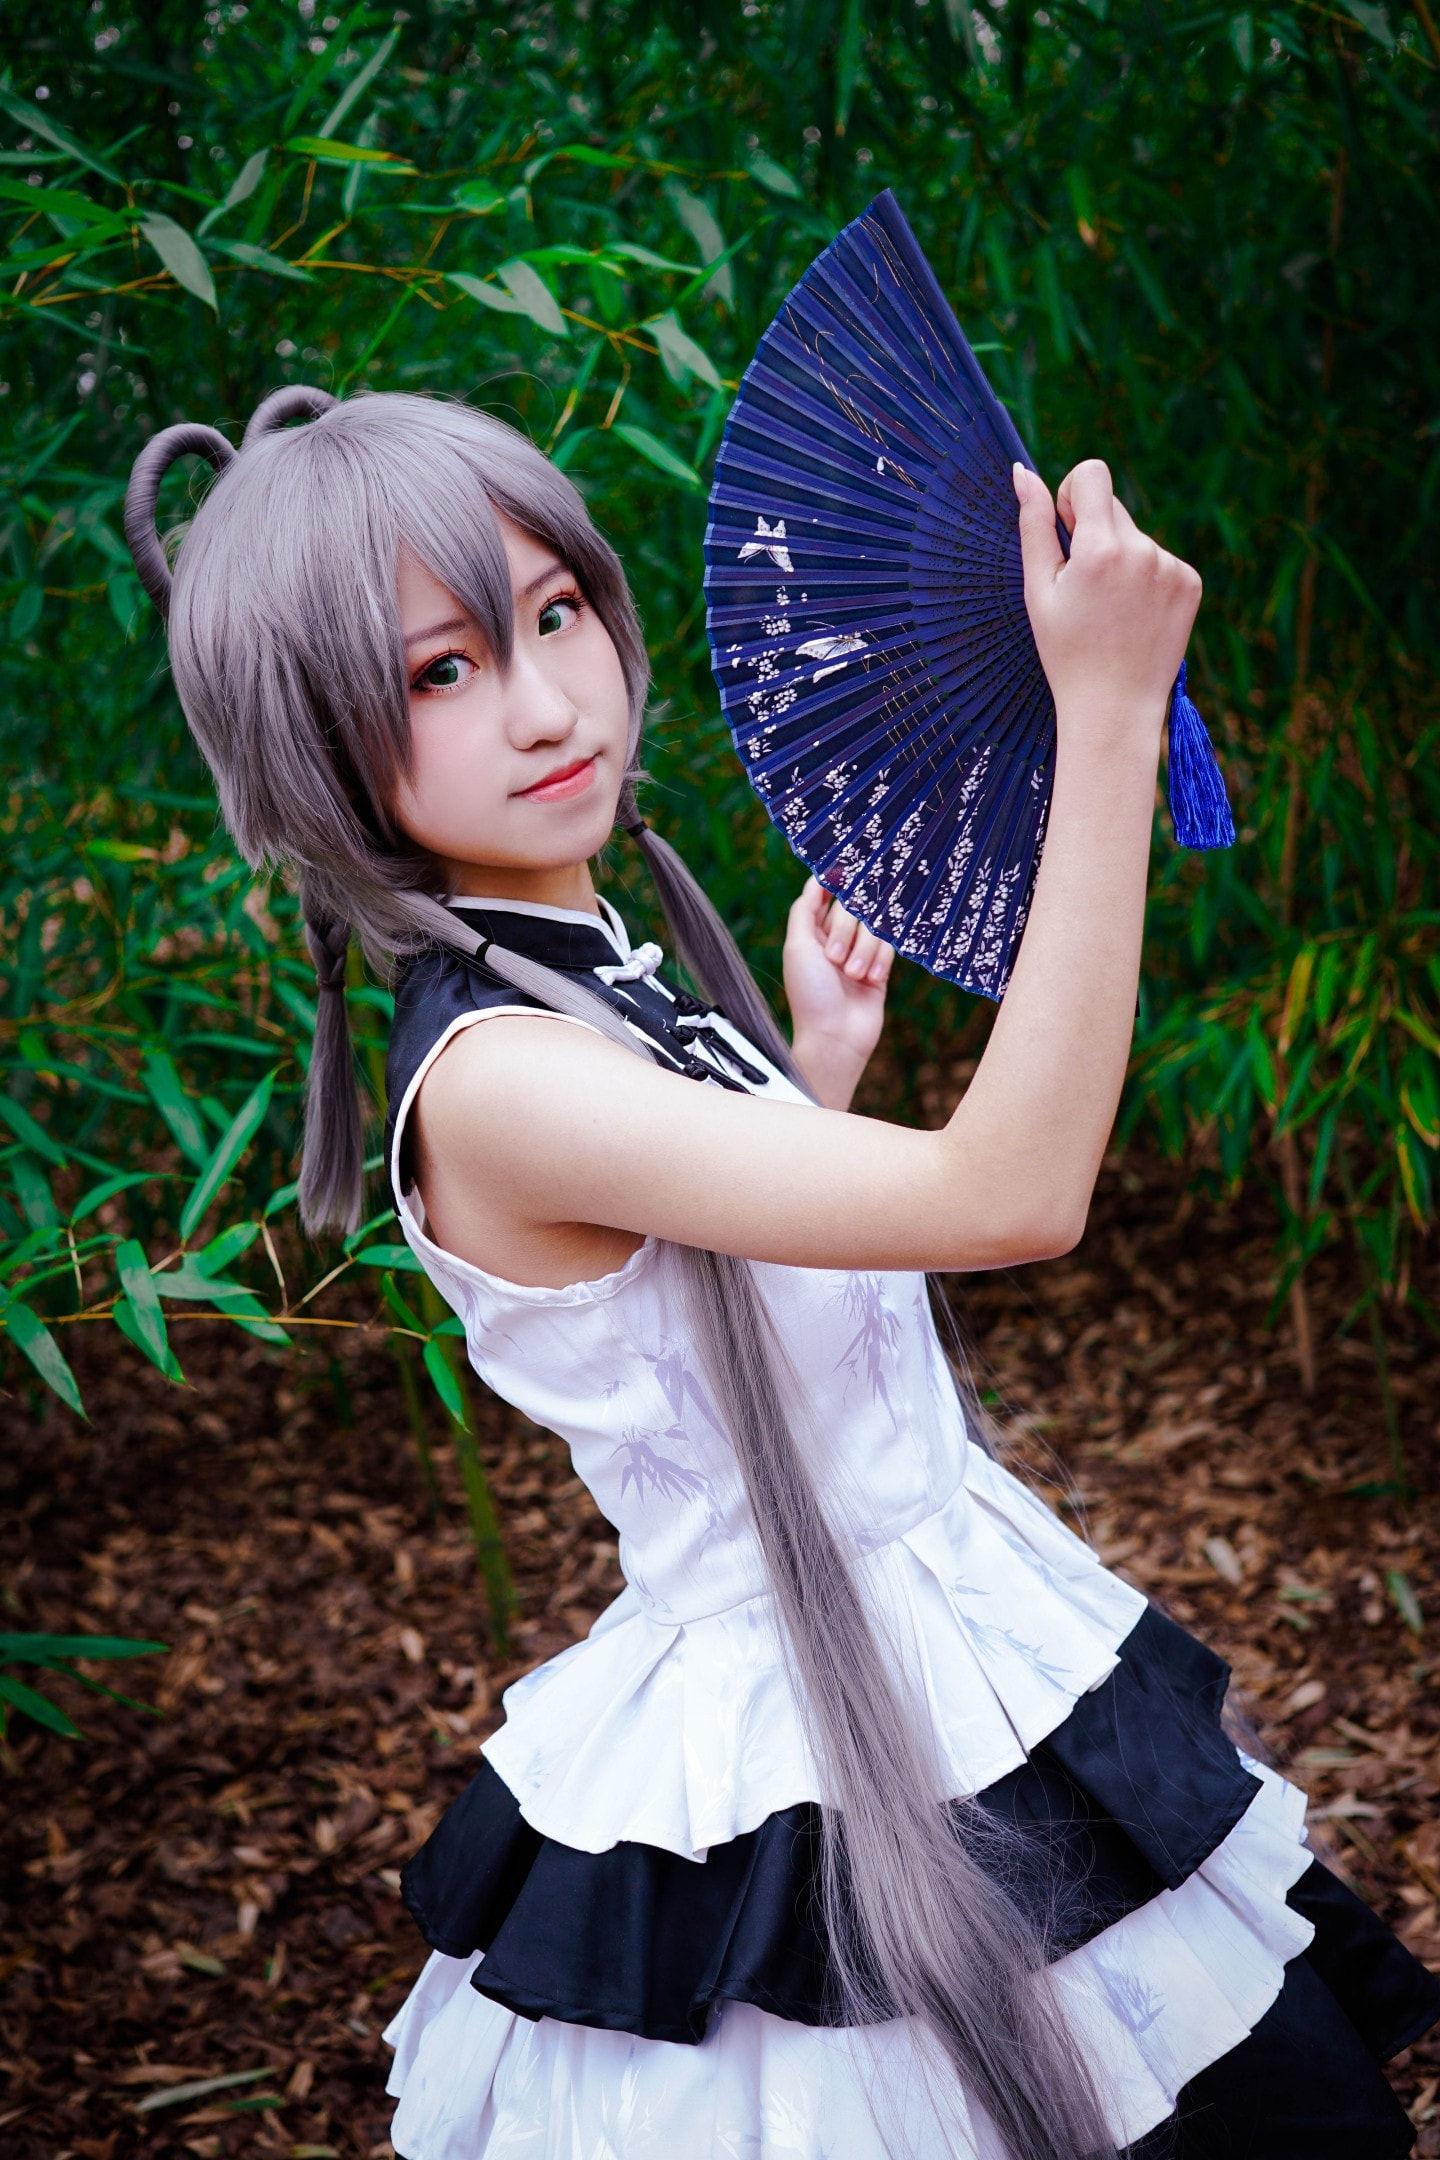 vocaloid洛天依cosplay插图(1)